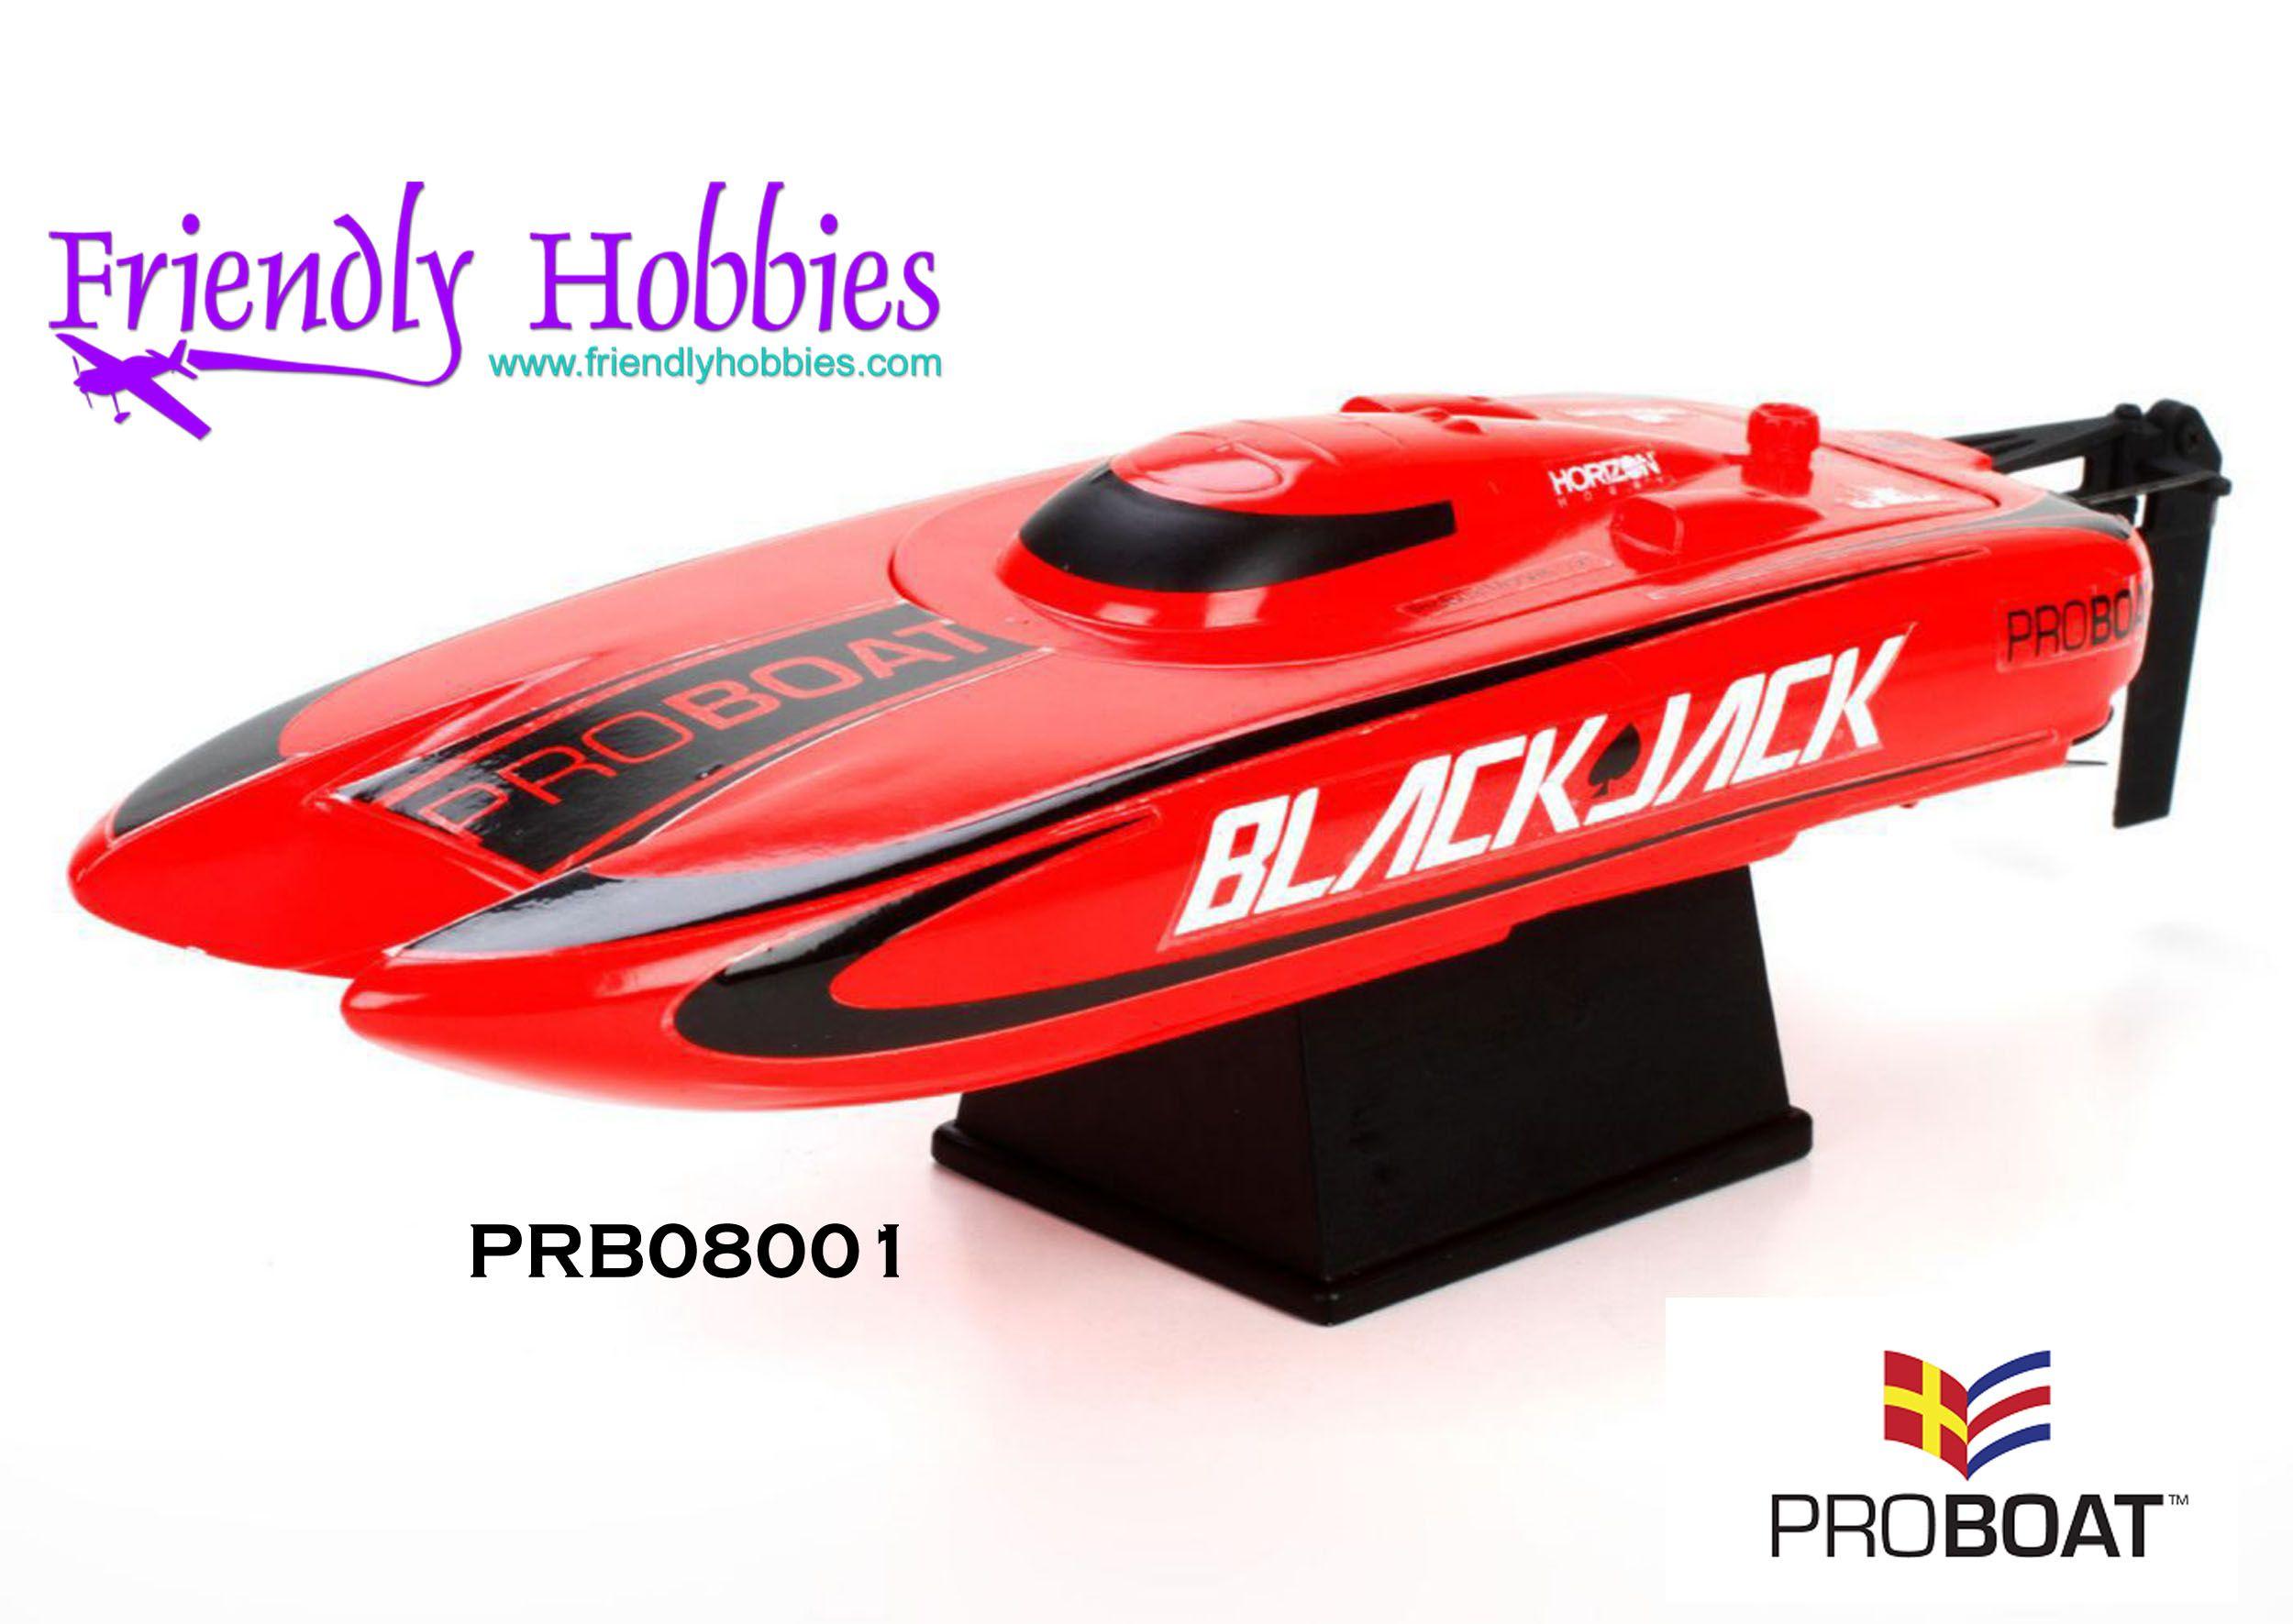 Blackjack Remote Control Boat